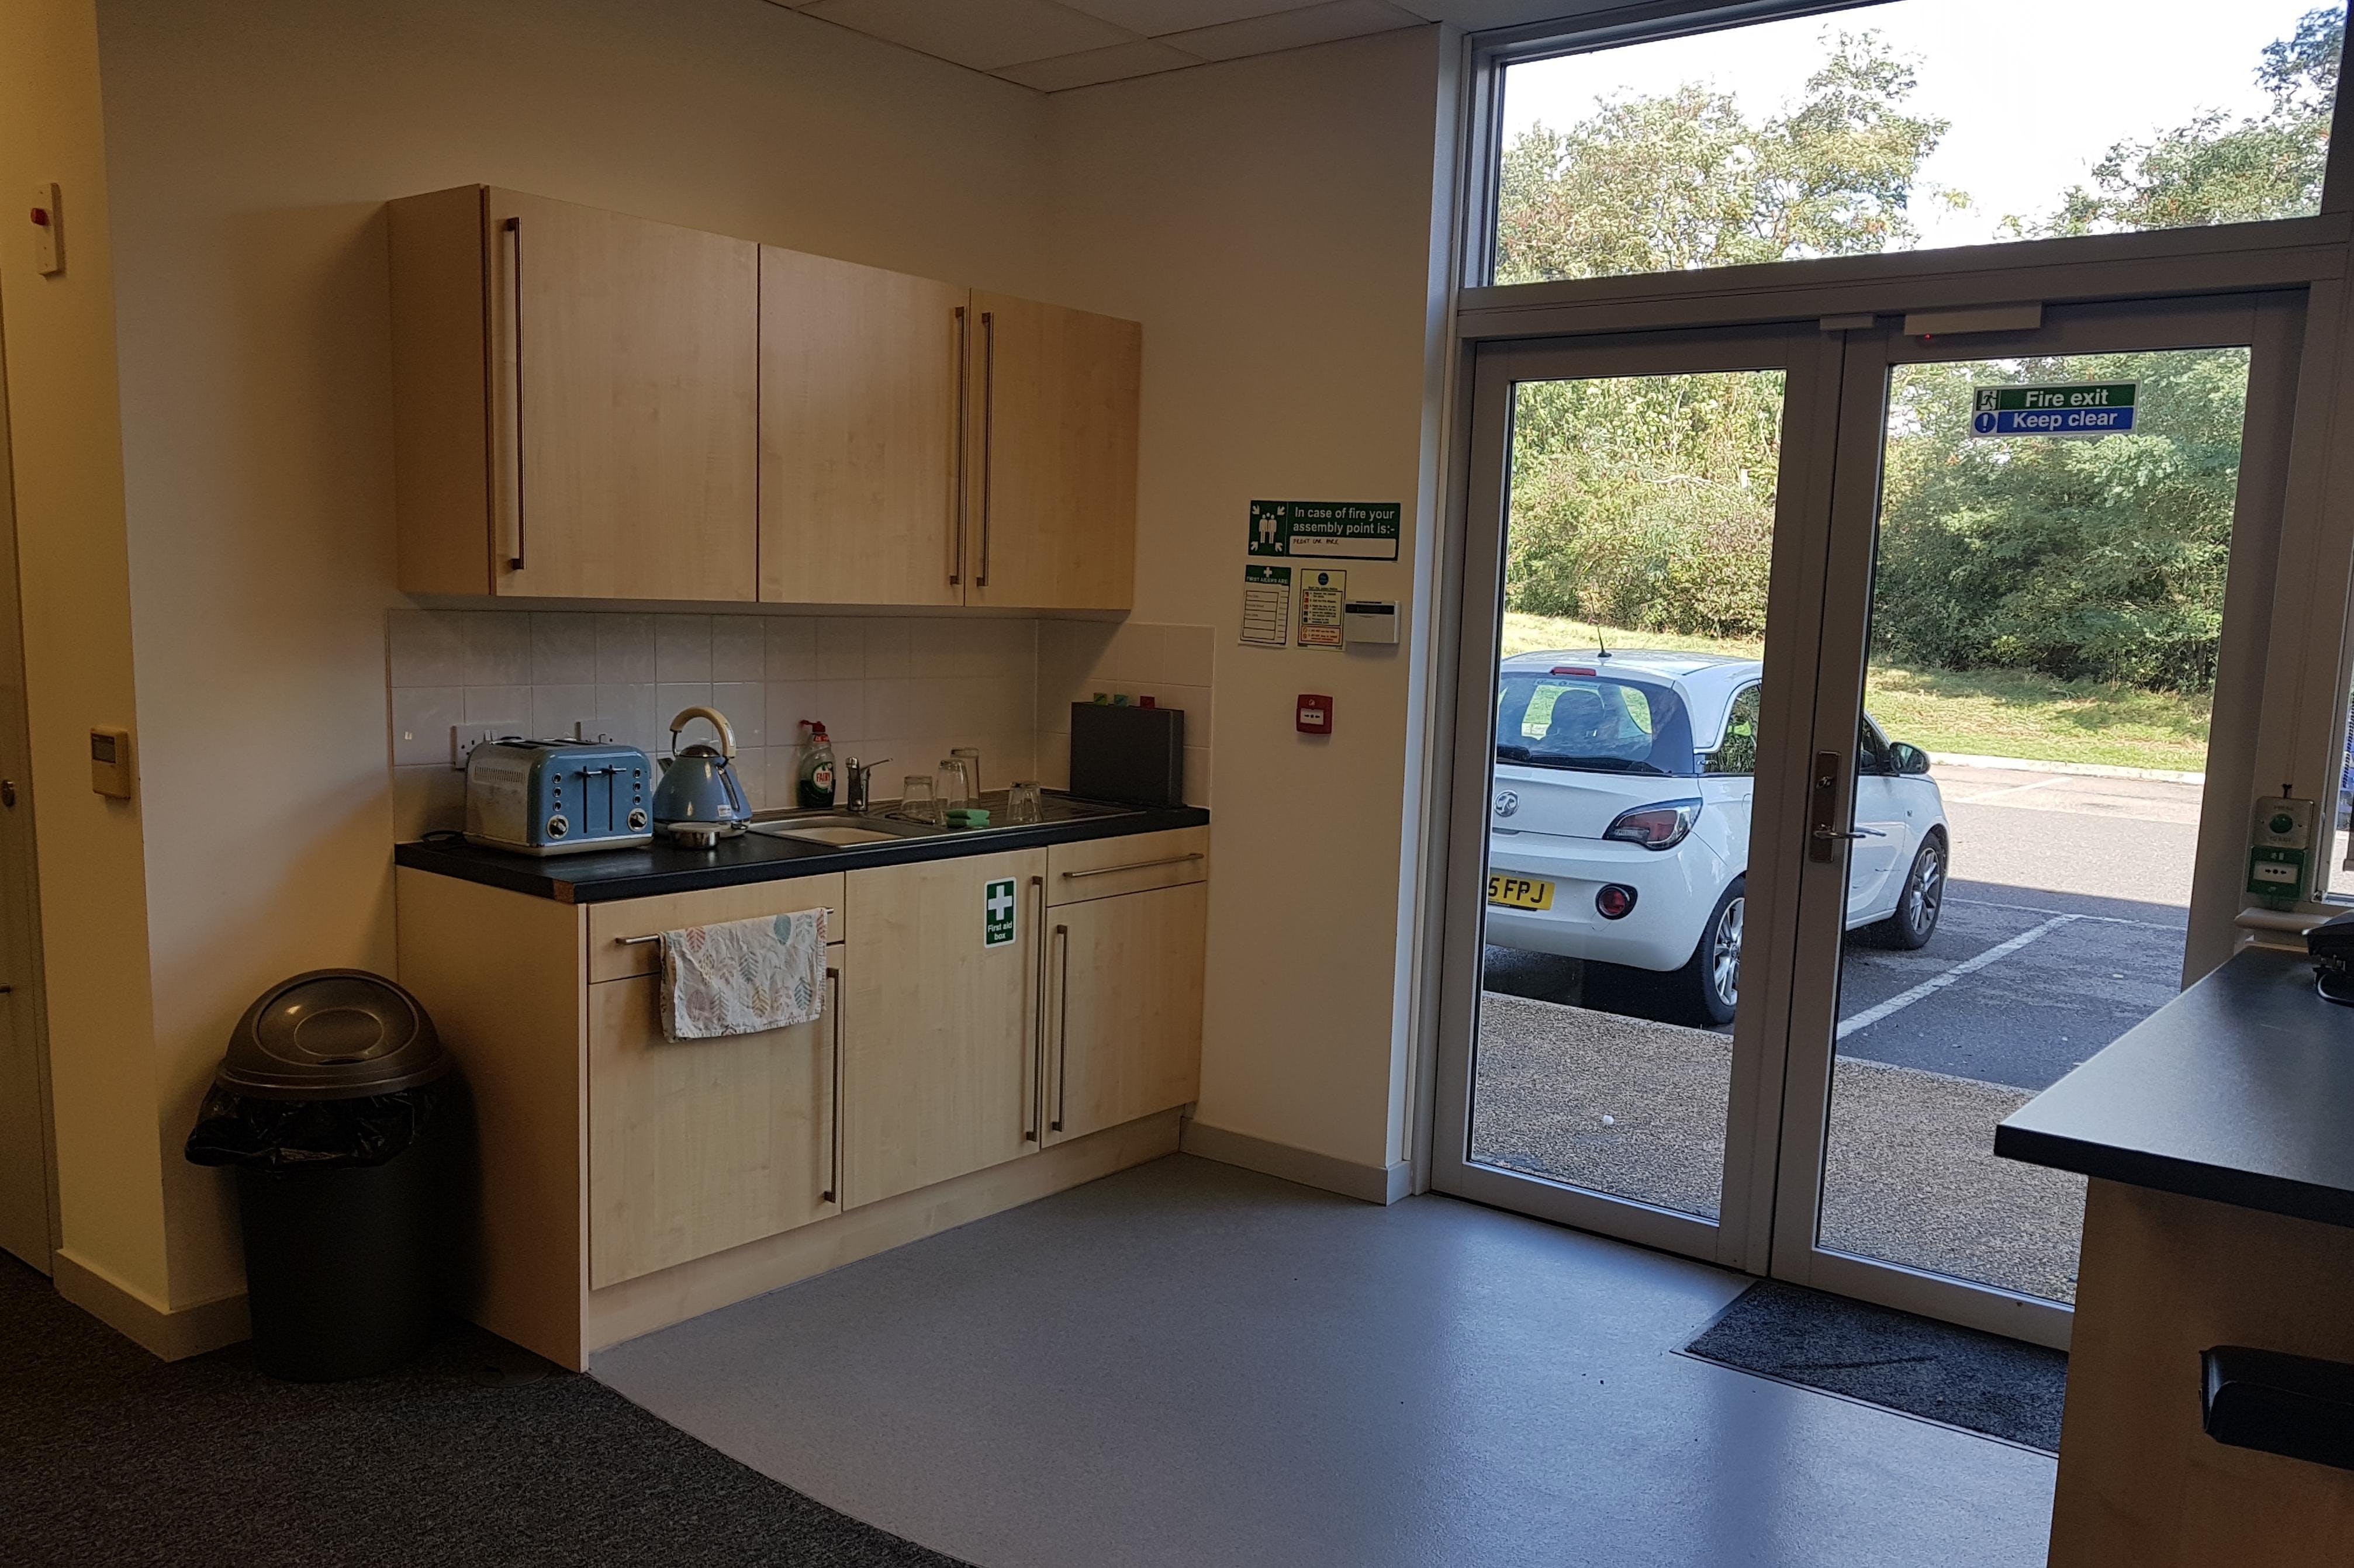 160 Eureka Park, Upper Pemberton, Ashford, Office To Let - 20201001_124725.jpg